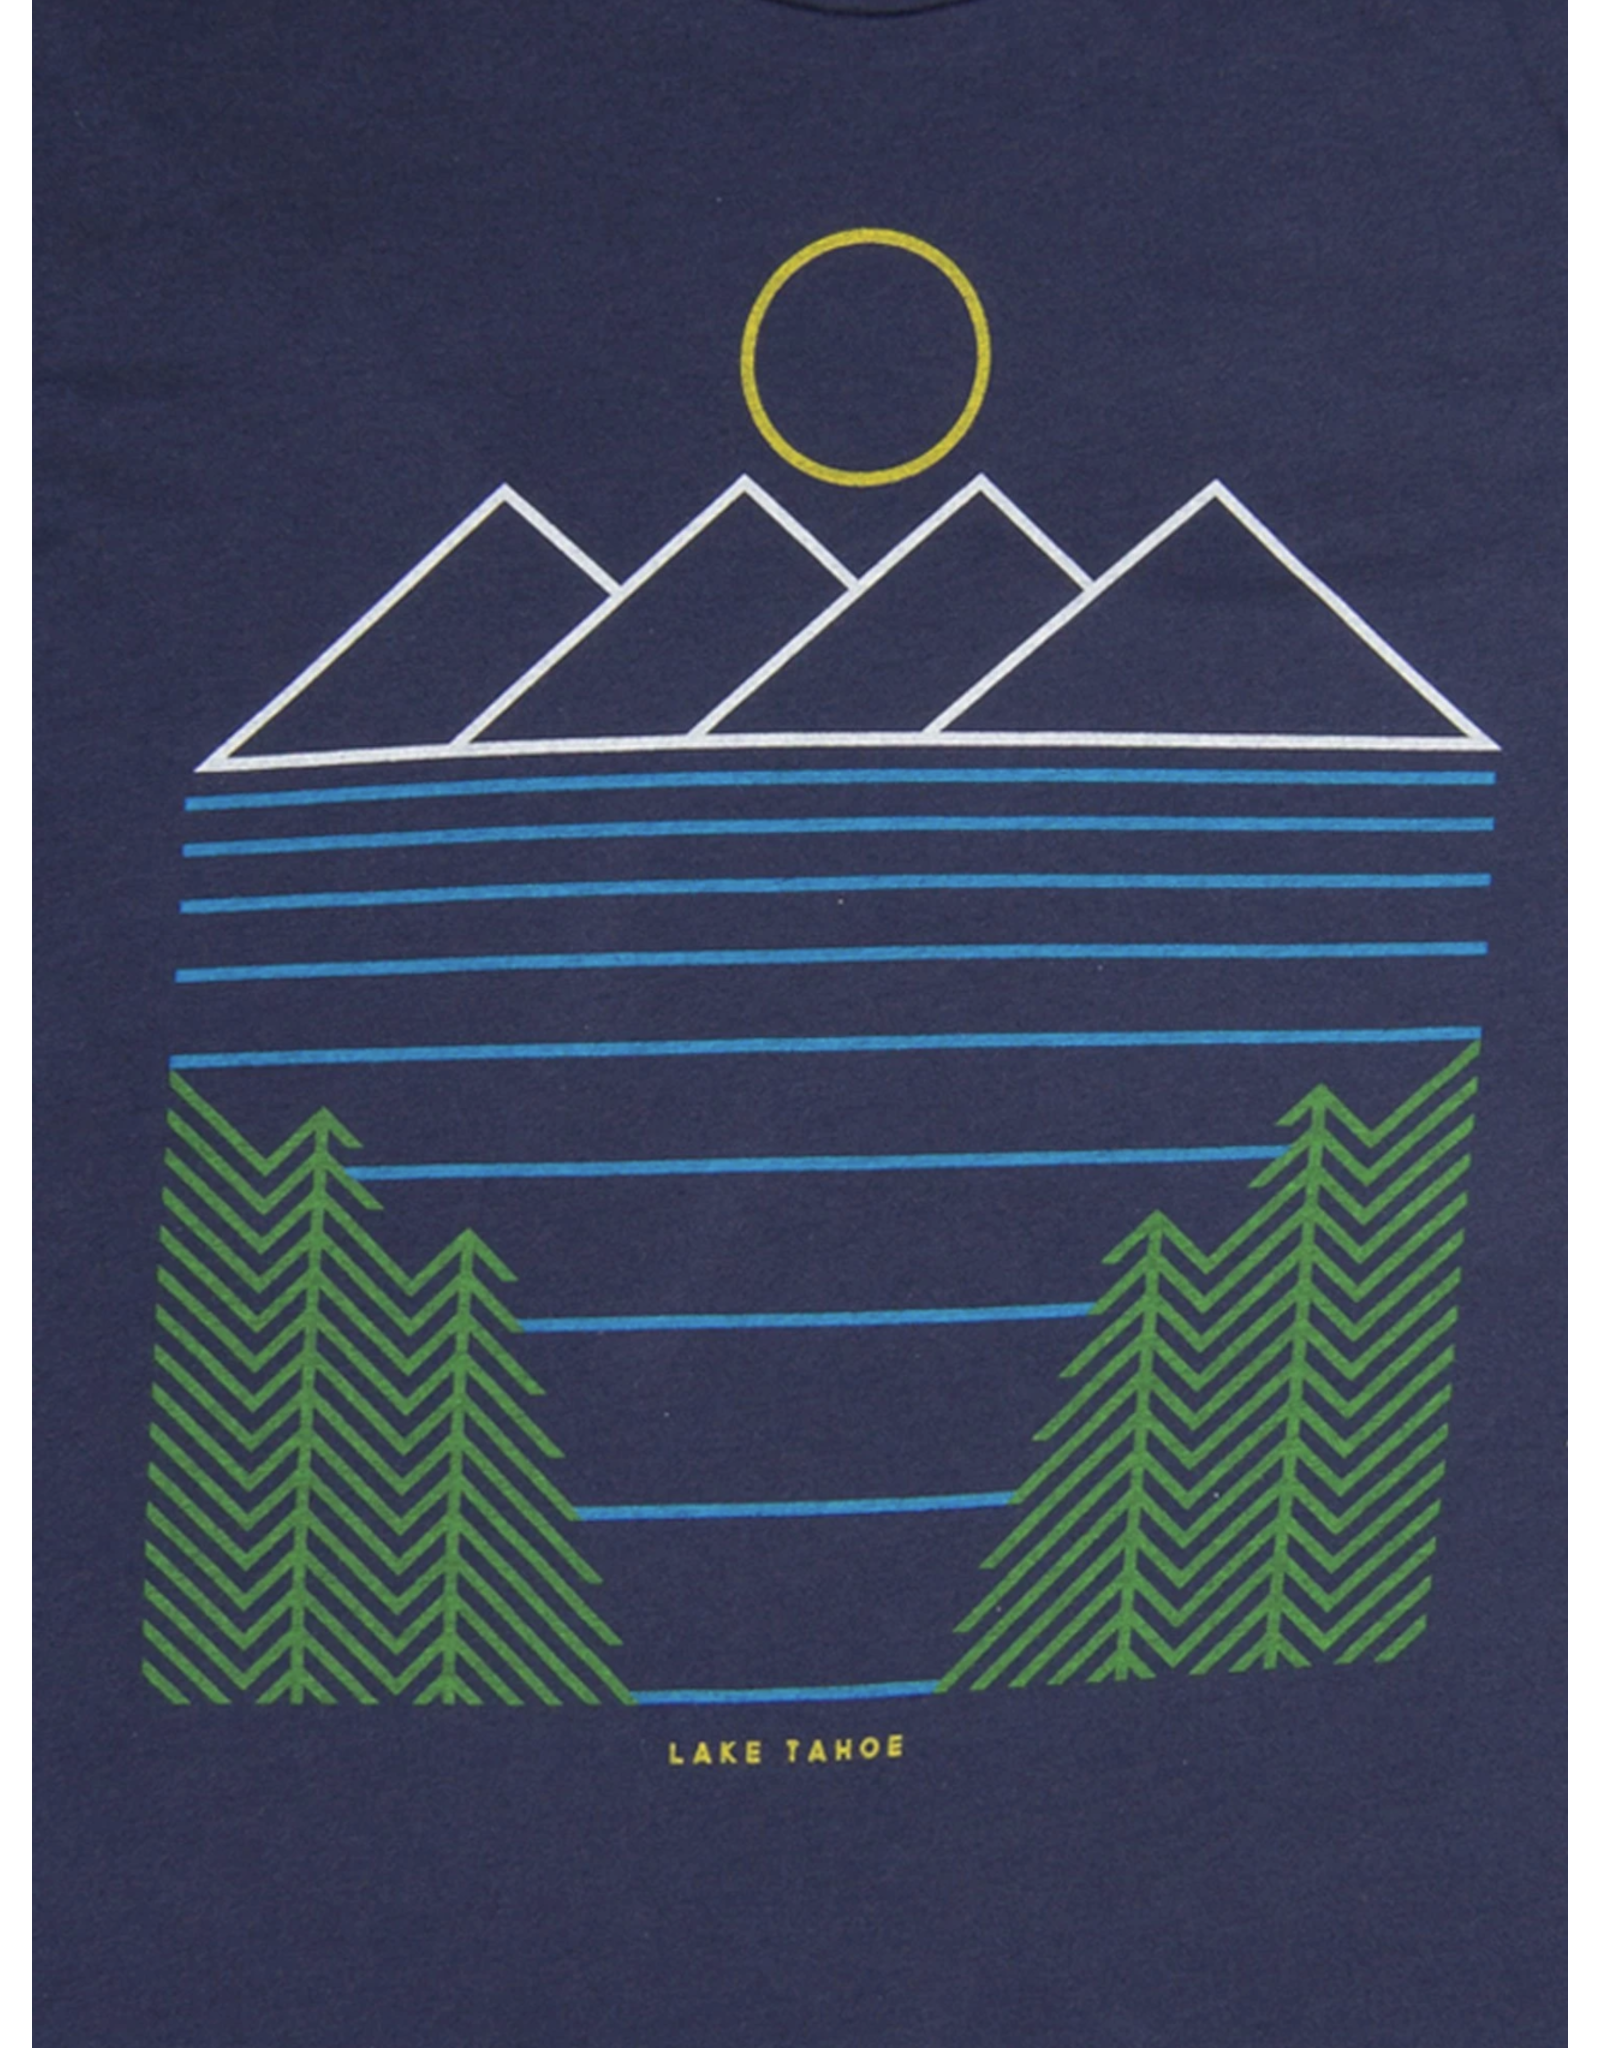 Culk Minimal Lake Tahoe Unisex Tee - Navy